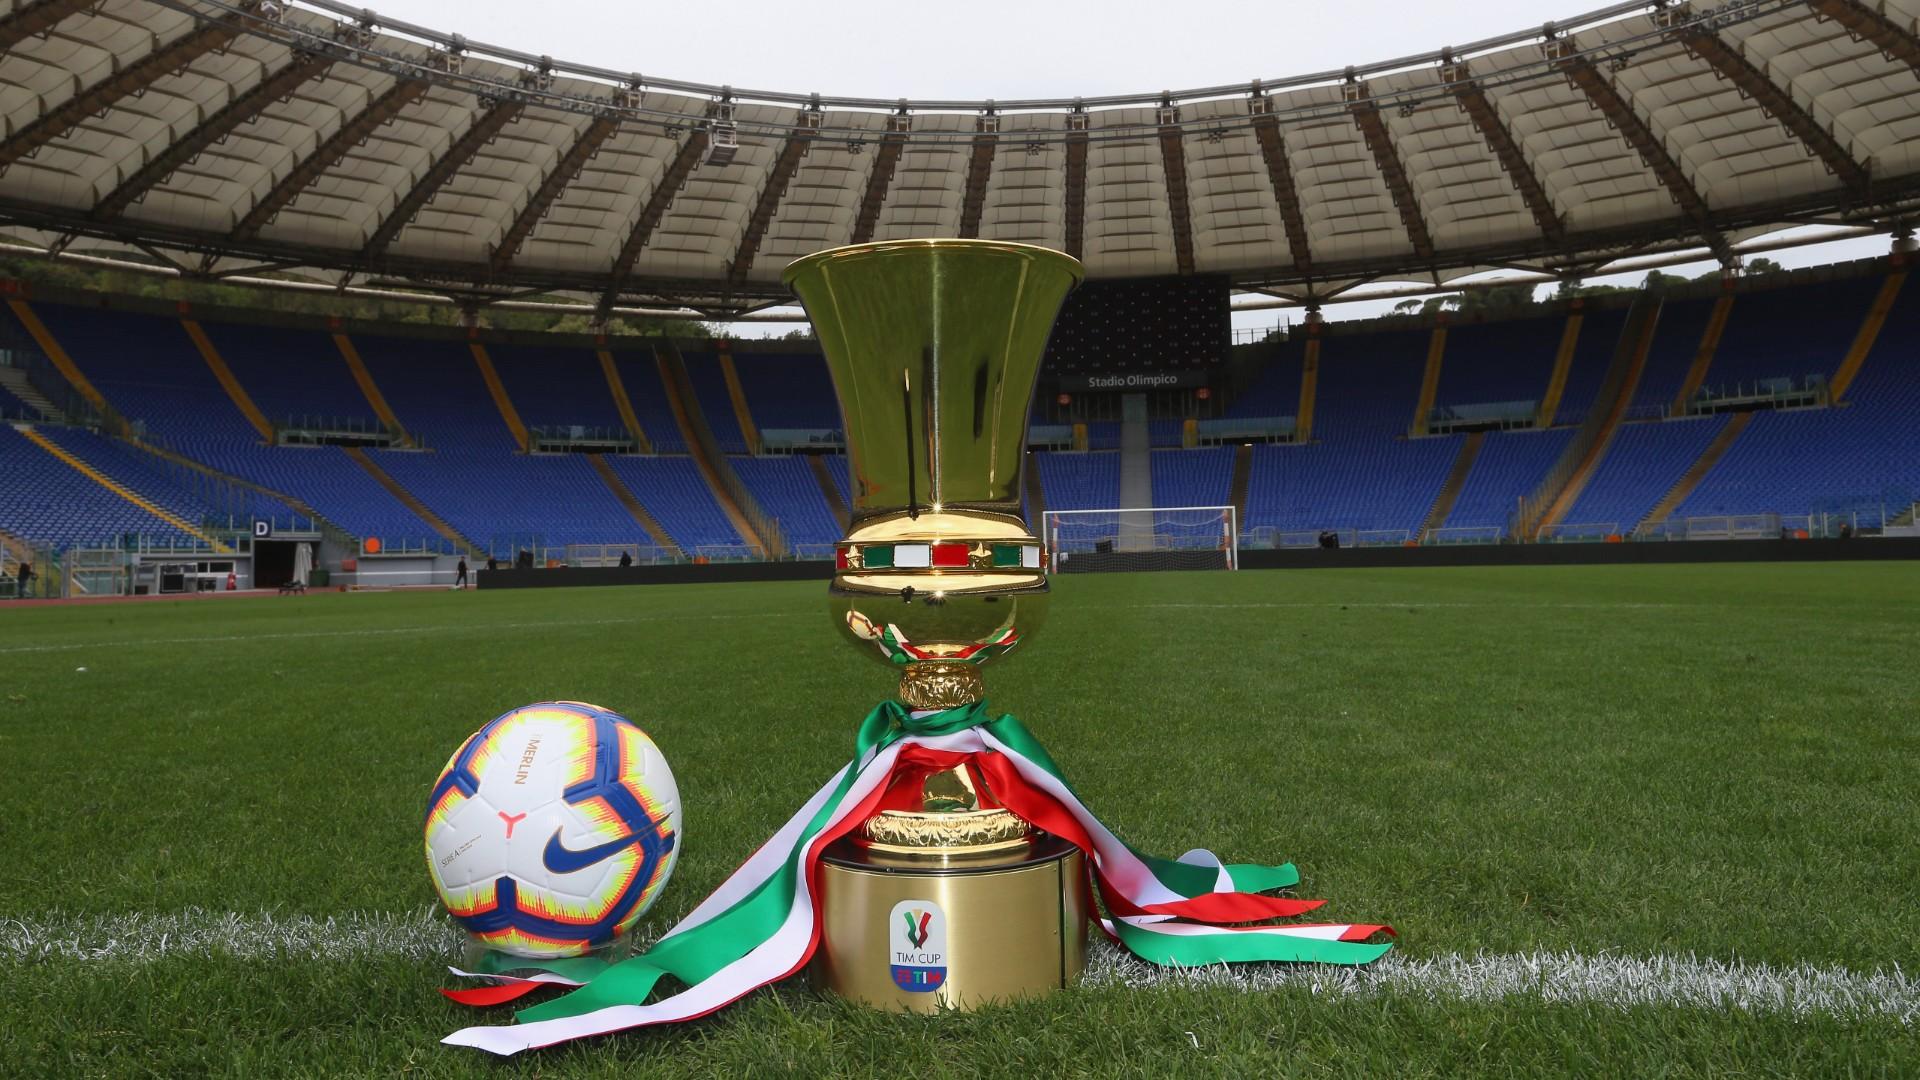 coppa italia trophy olimpico roma 17sz5knz7bu811g8j6nlo699vi